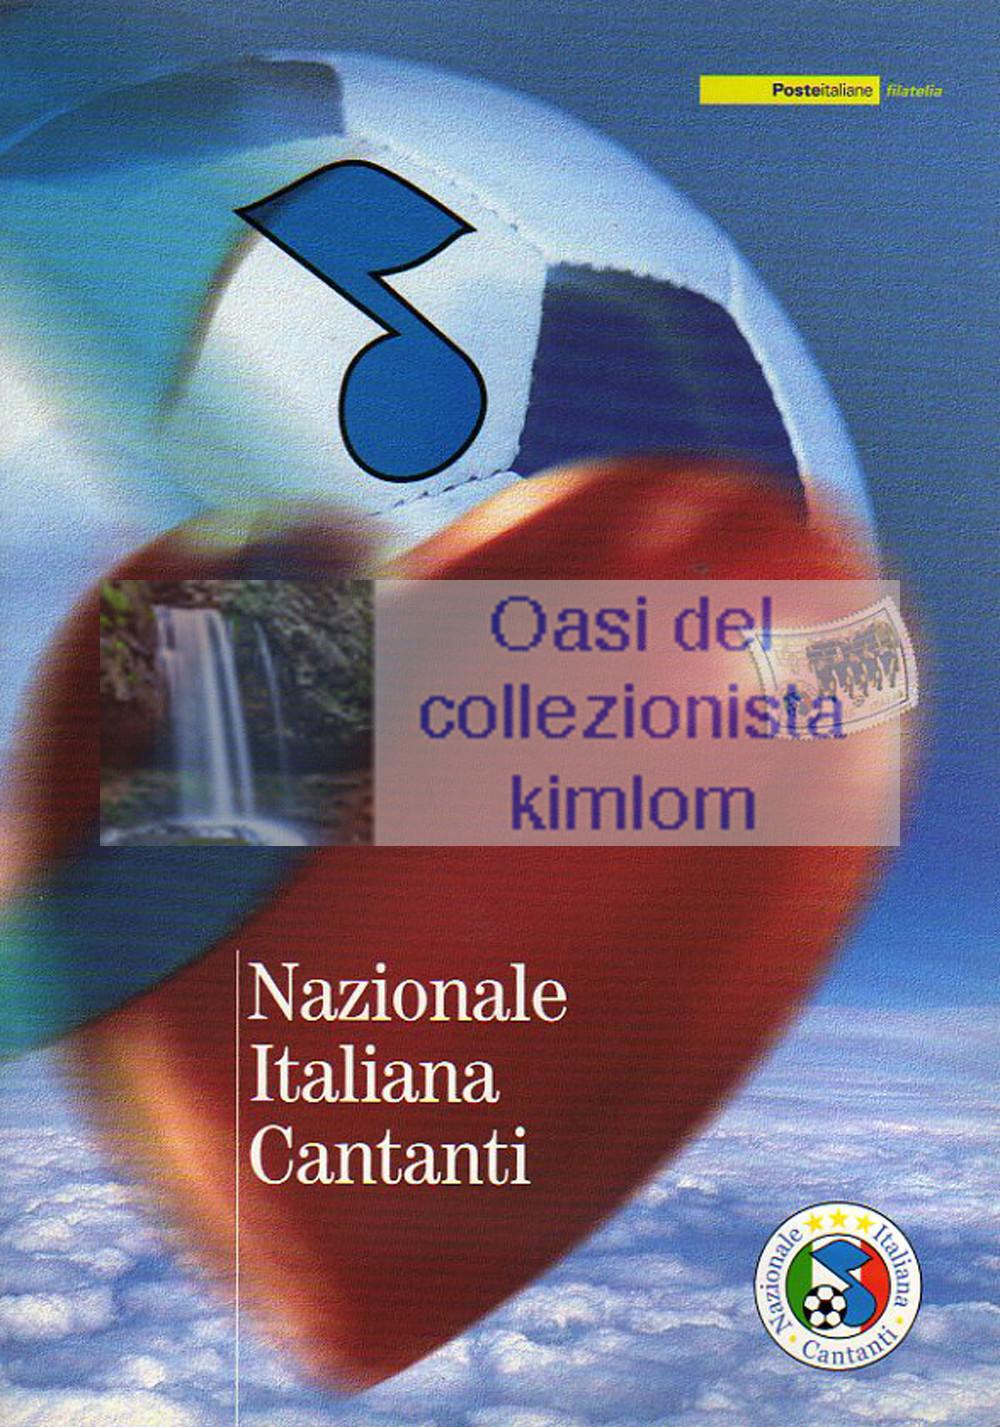 folder - Nazionale Italiana Cantanti